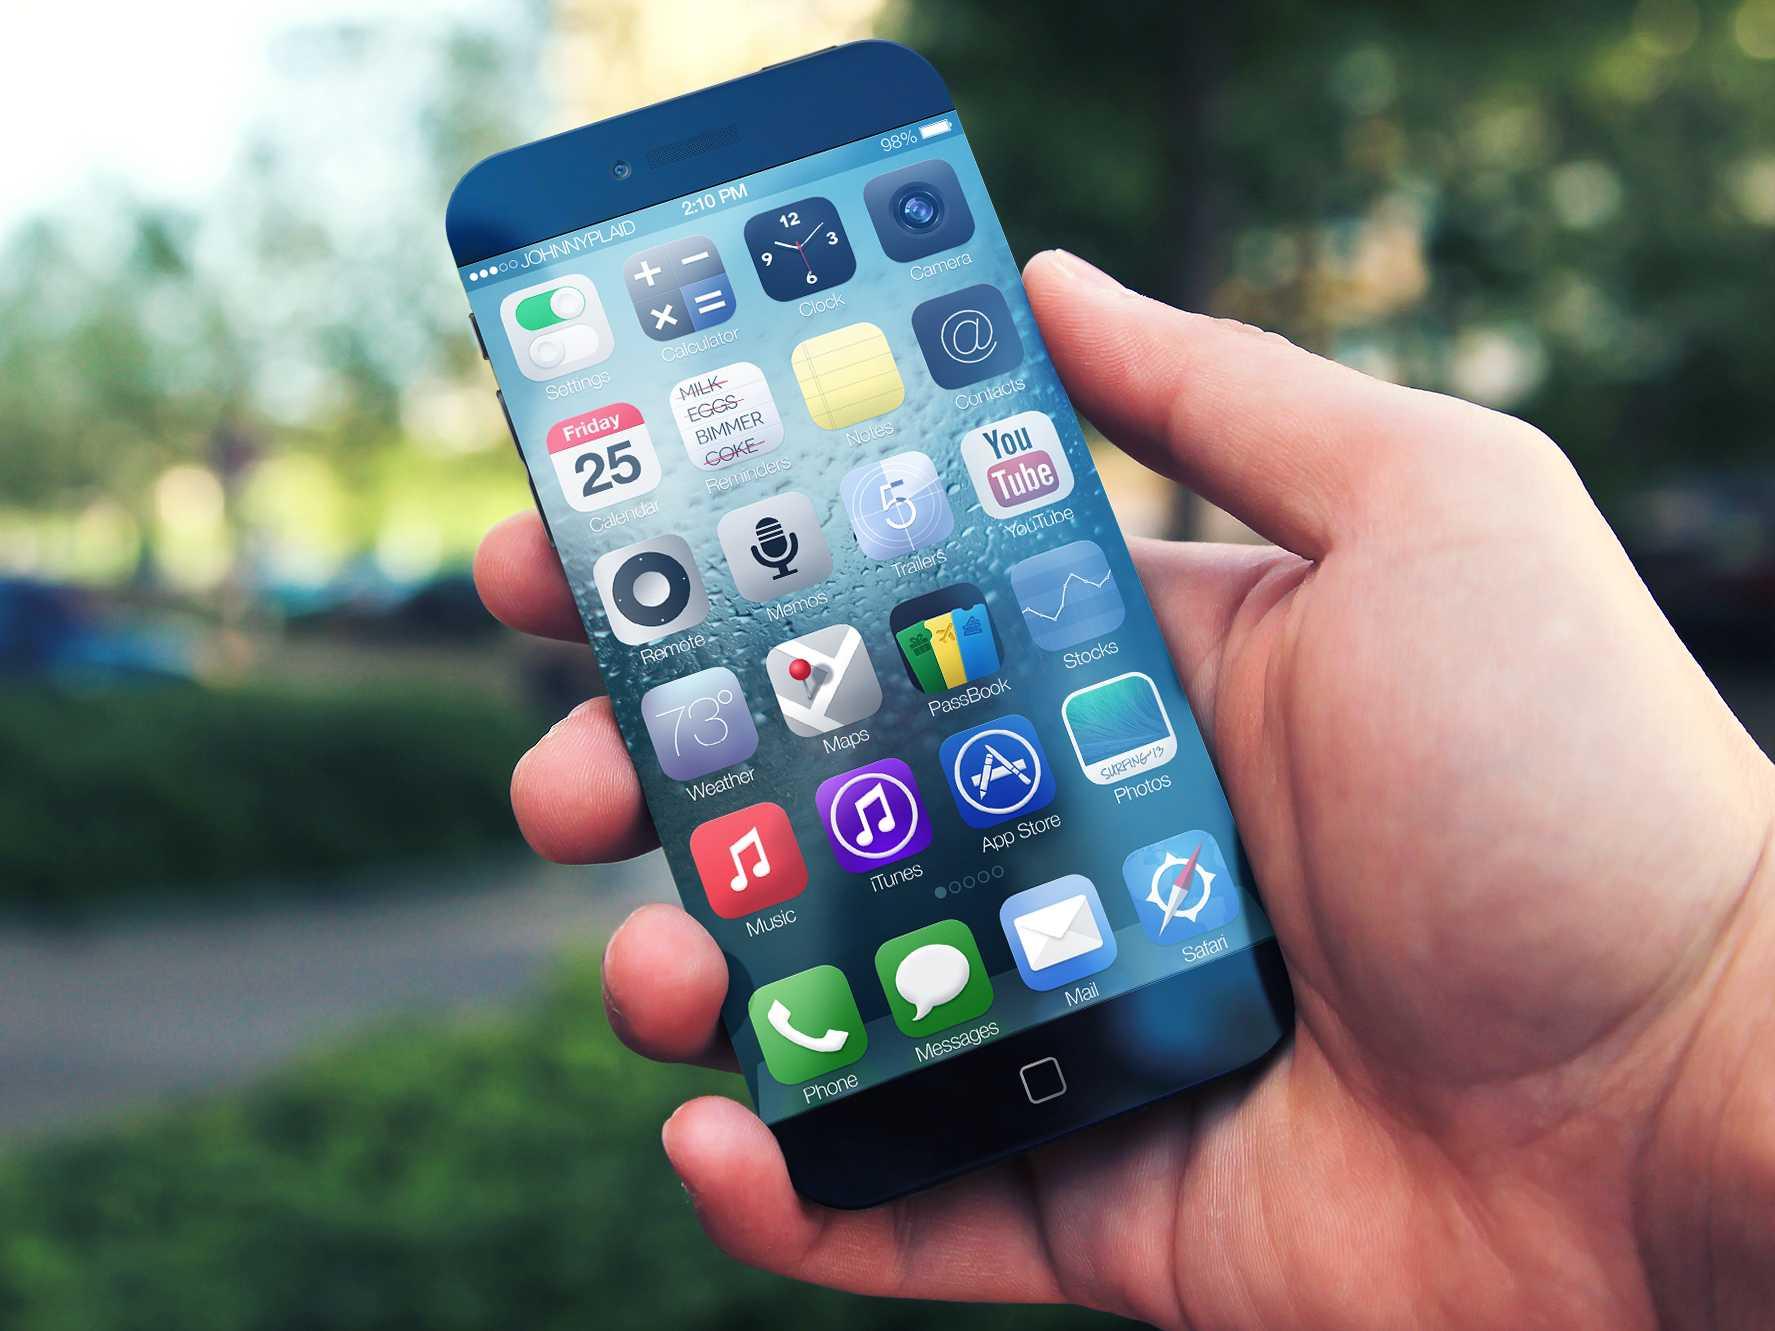 iPhone 6 senza cornici laterali